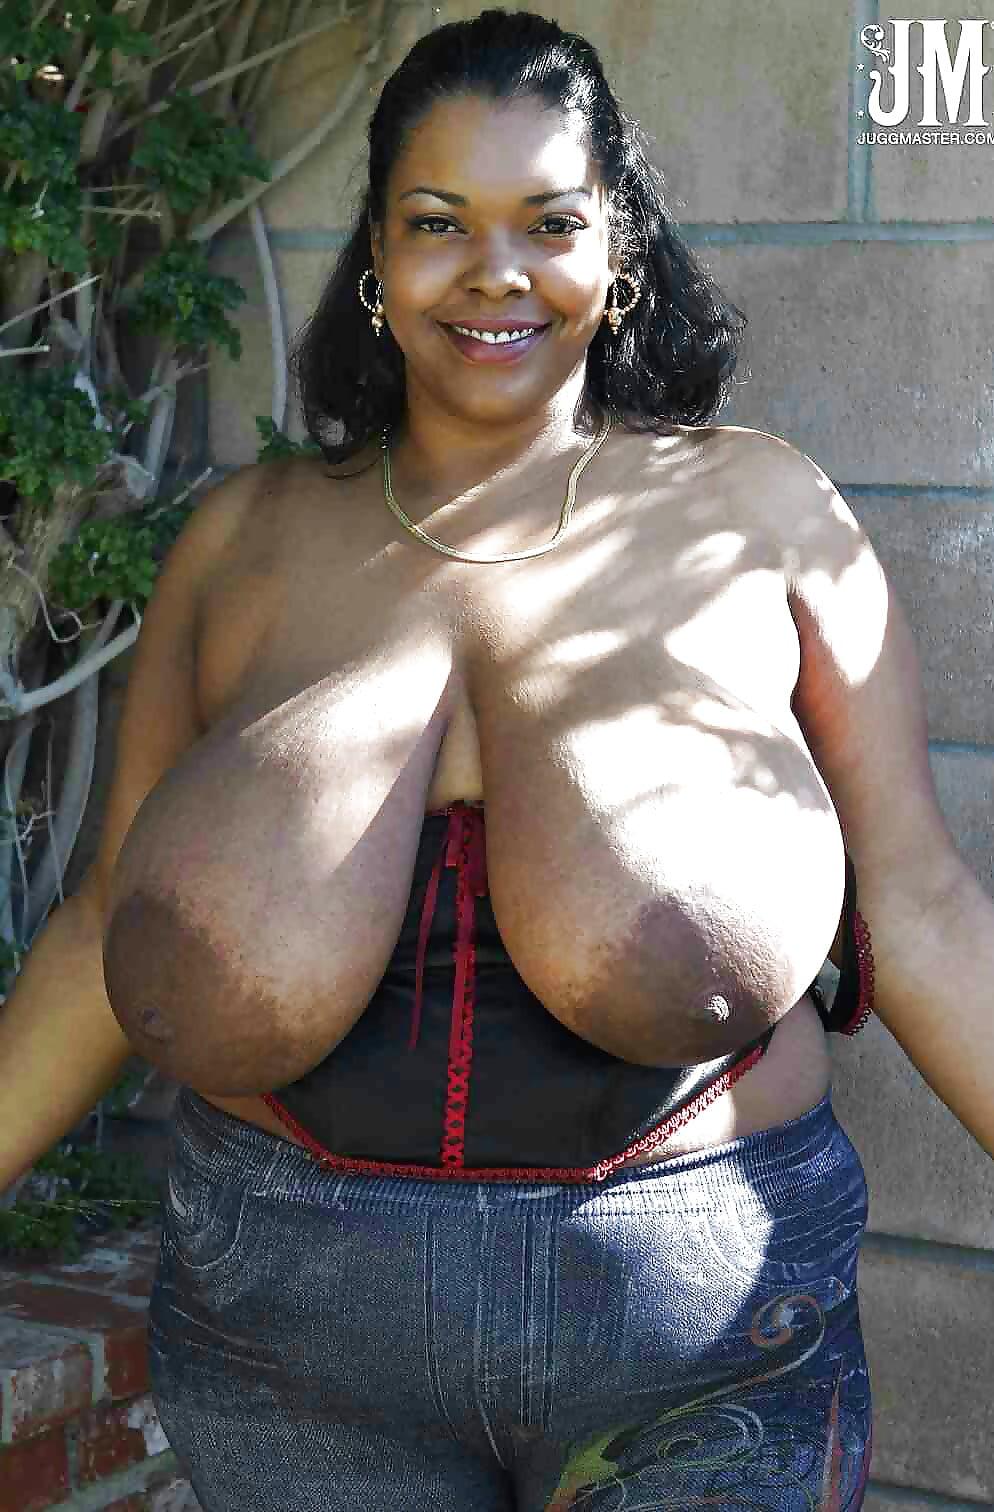 Black Beauty With Big Boobs  Areola - 32 Pics  Xhamster-1738